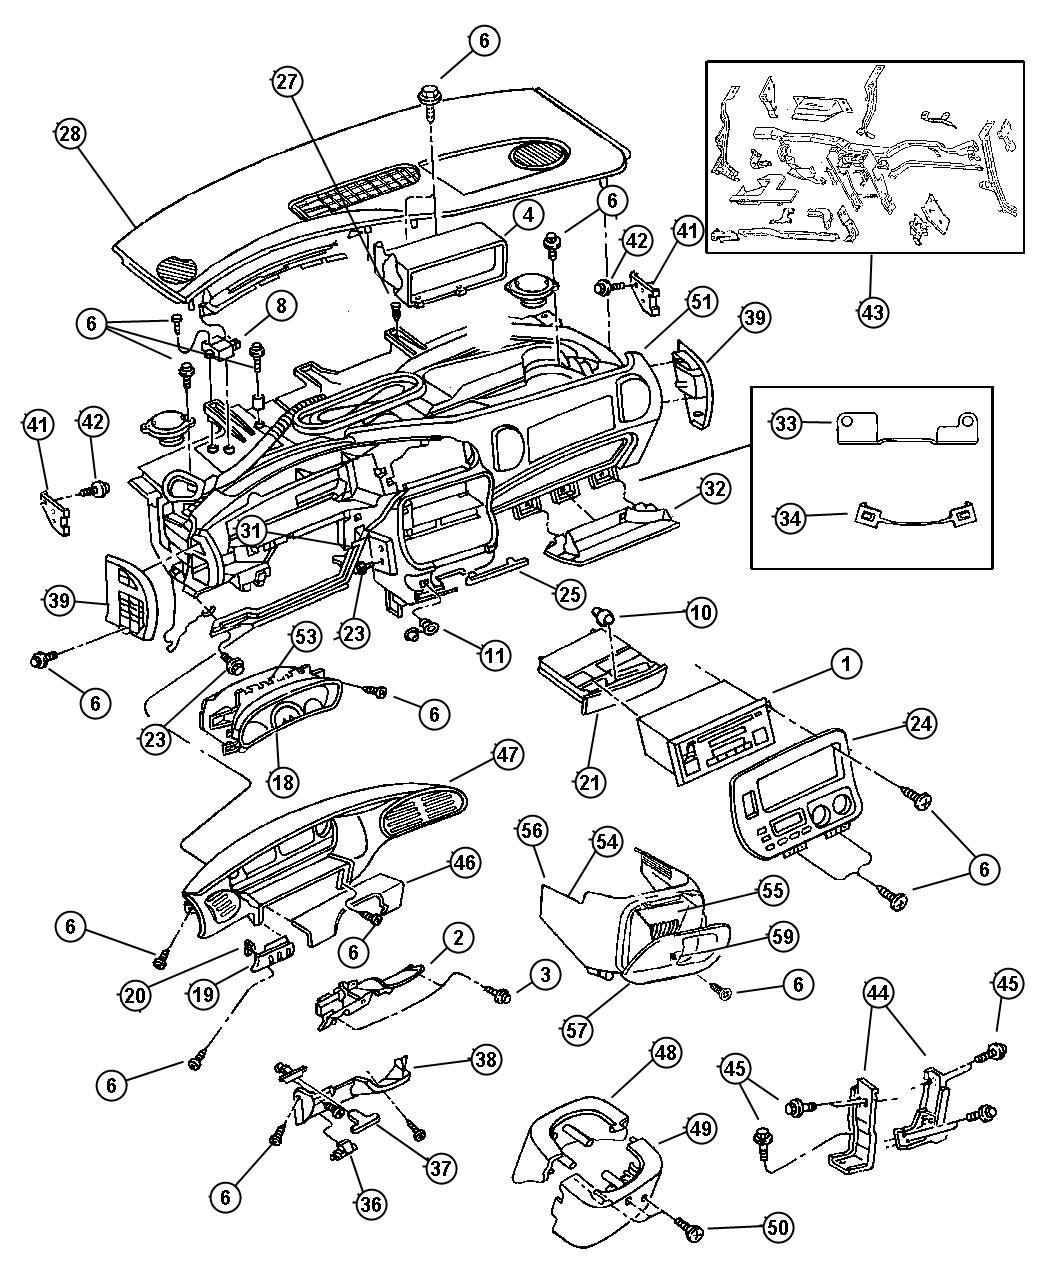 1997 Dodge Caravan Engine Diagram Wiring Diagrams Bounce Metal A Bounce Metal A Alcuoredeldiabete It